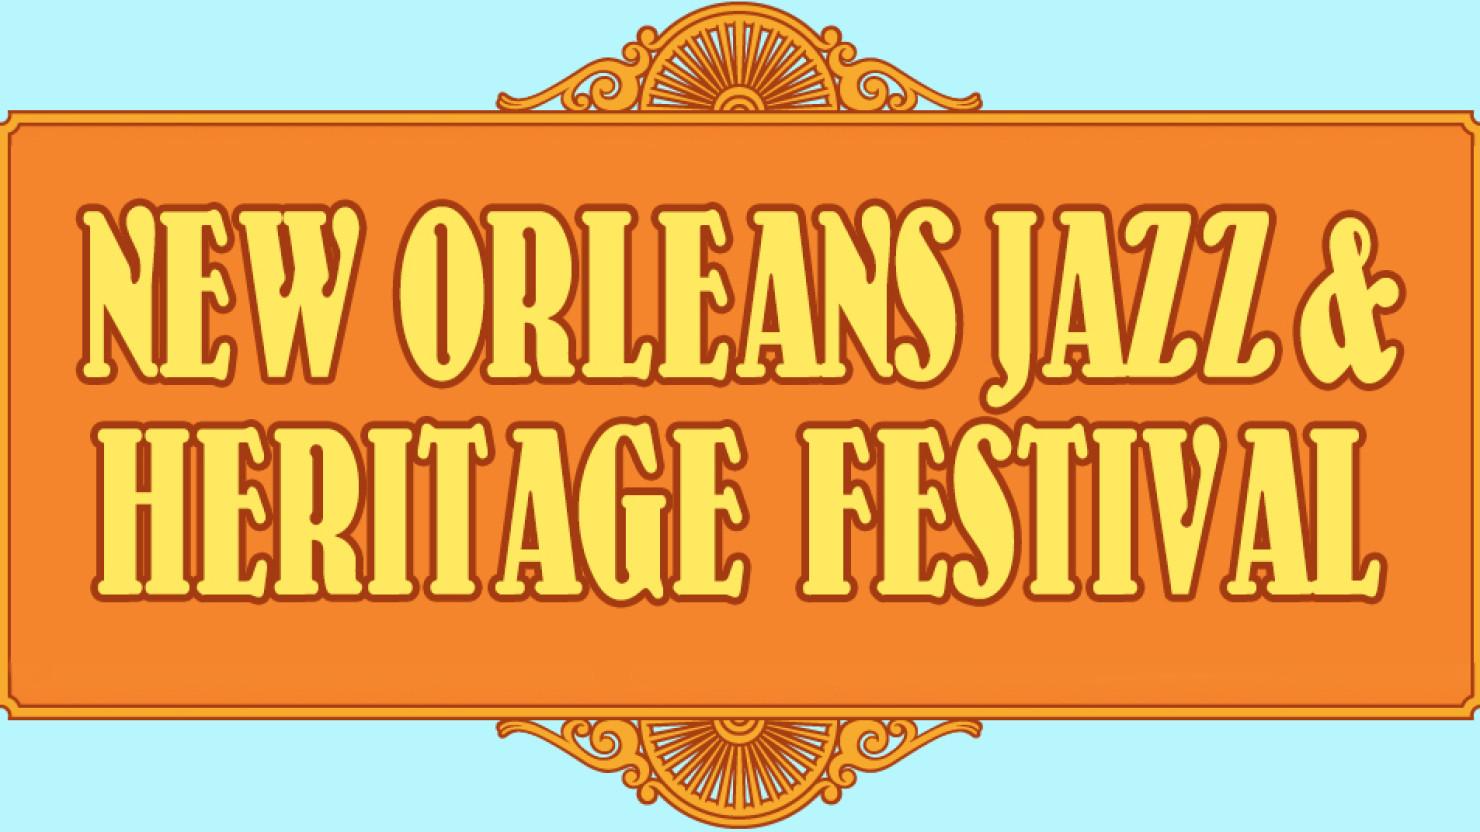 new orleans jazz heritage - photo #4